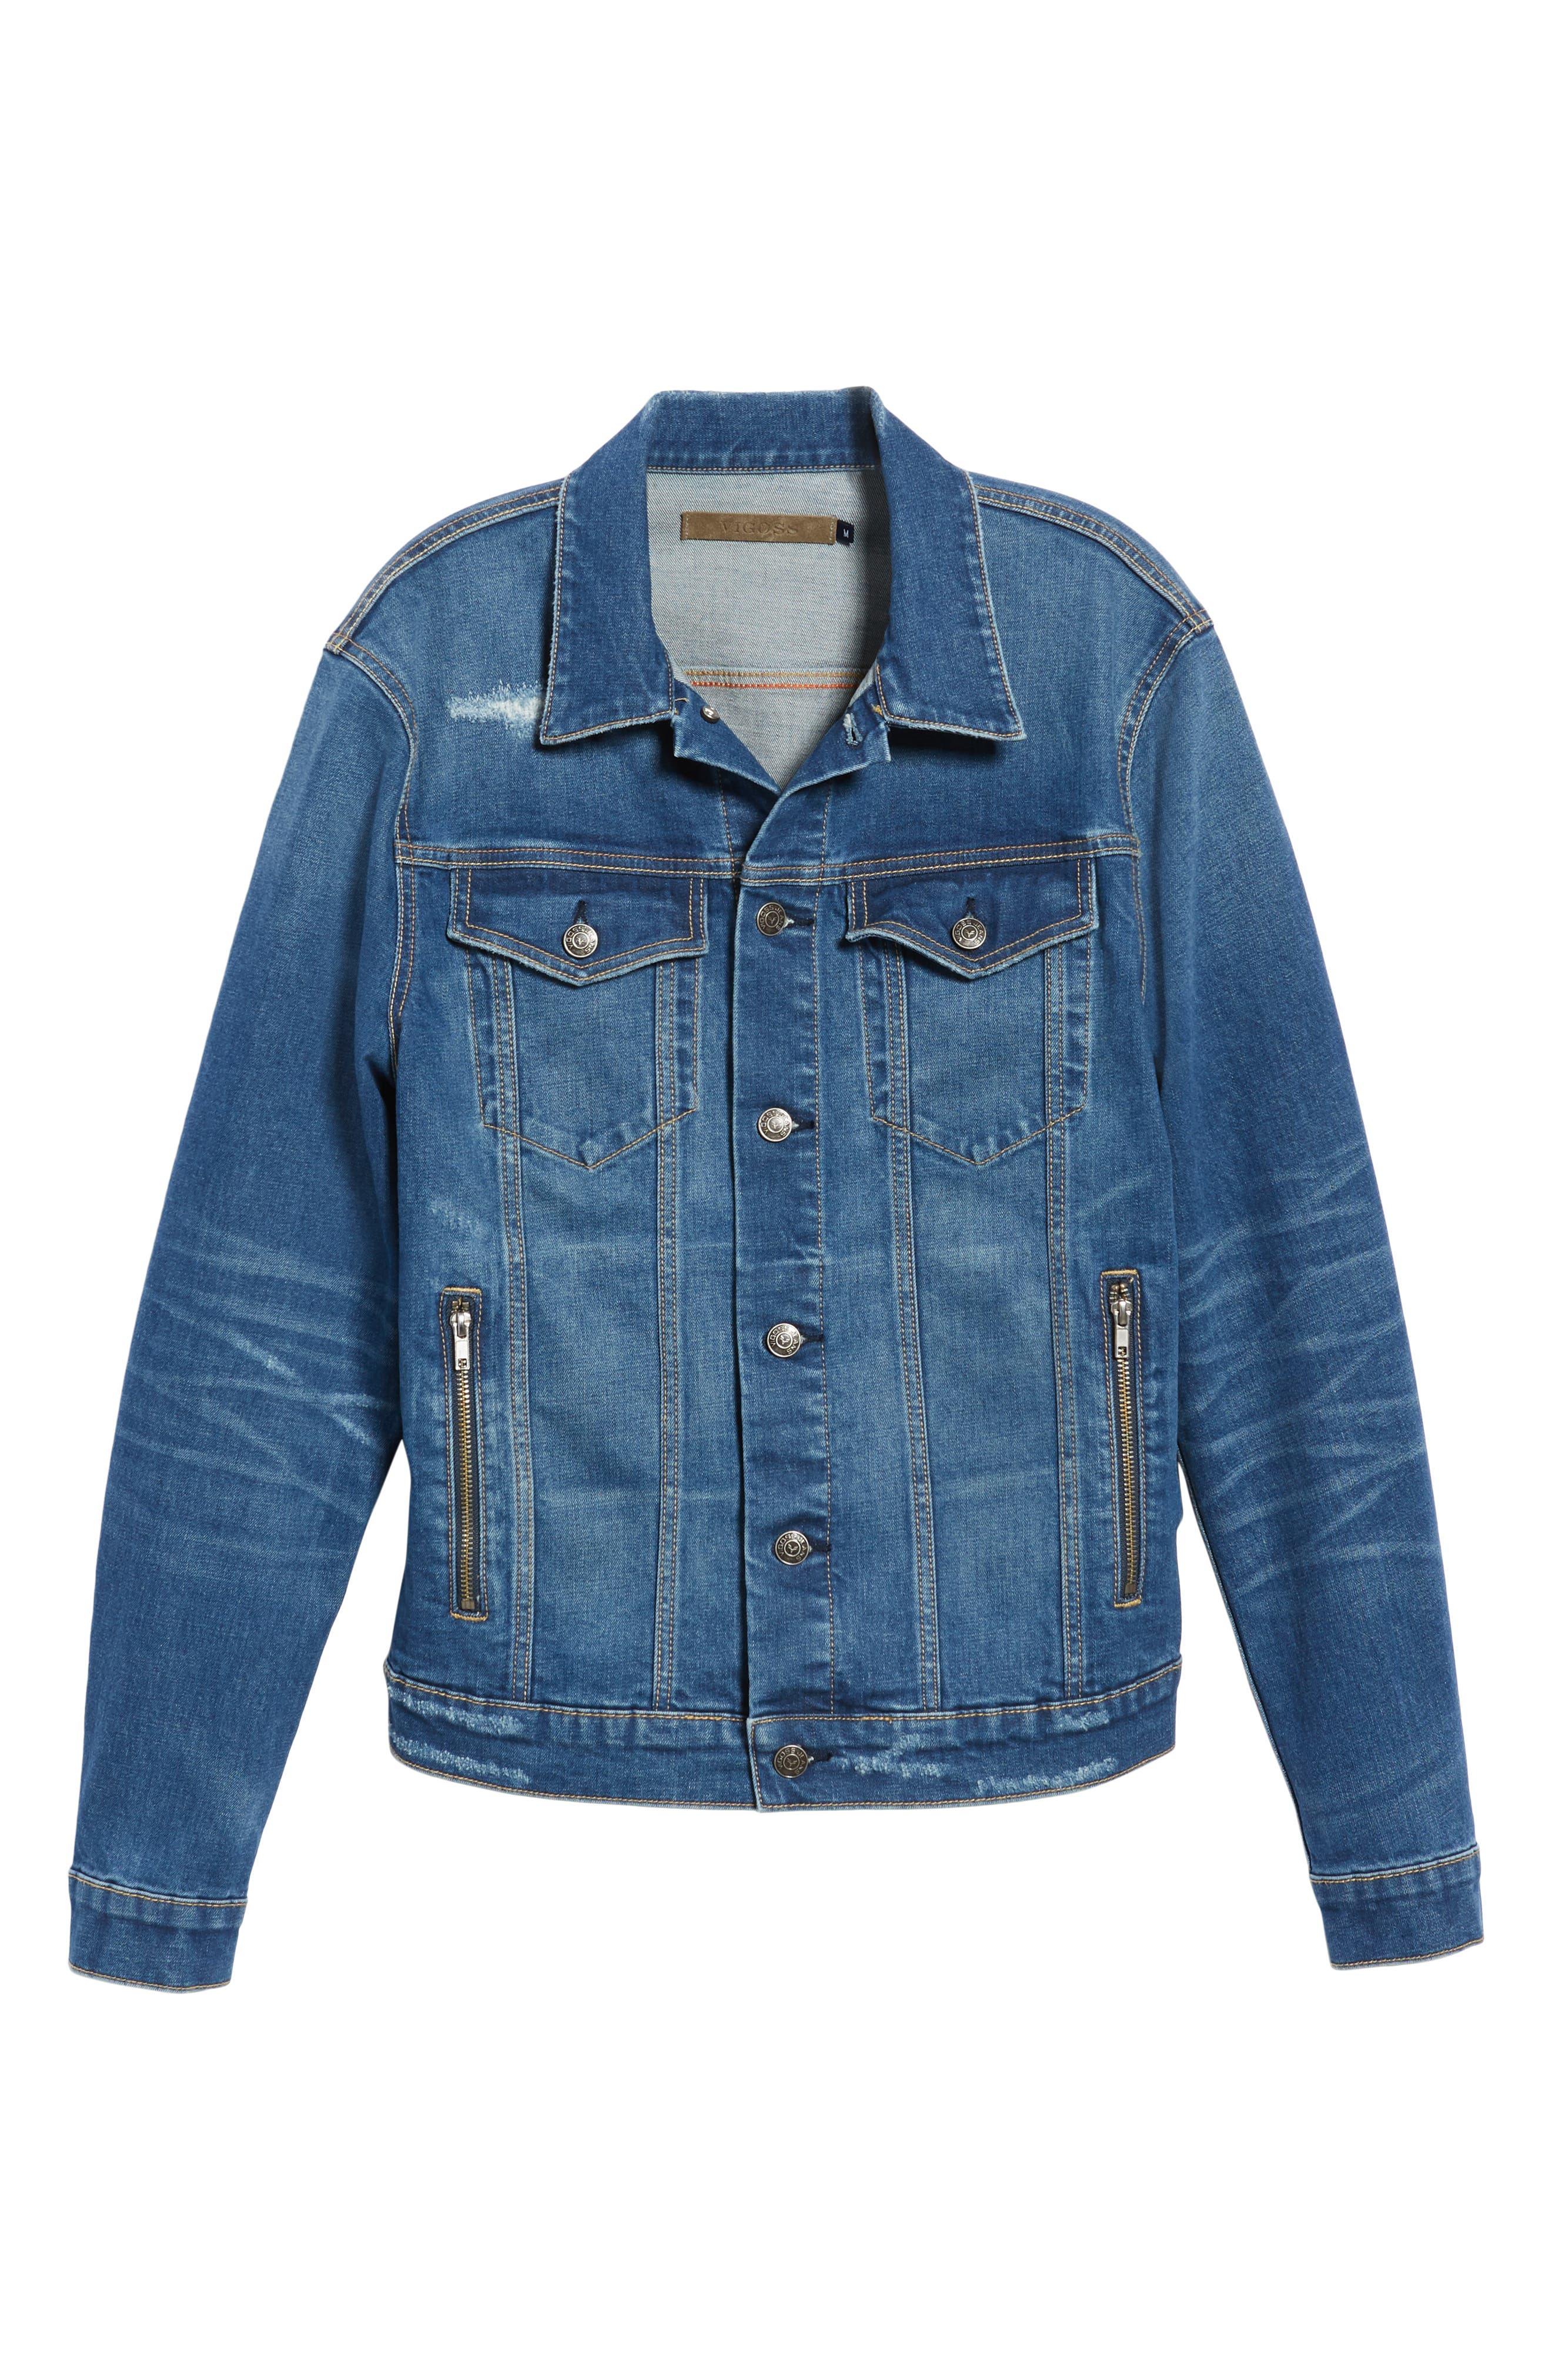 VIGOSS,                             Denim Trucker Jacket,                             Alternate thumbnail 6, color,                             BLUE VINTAGE